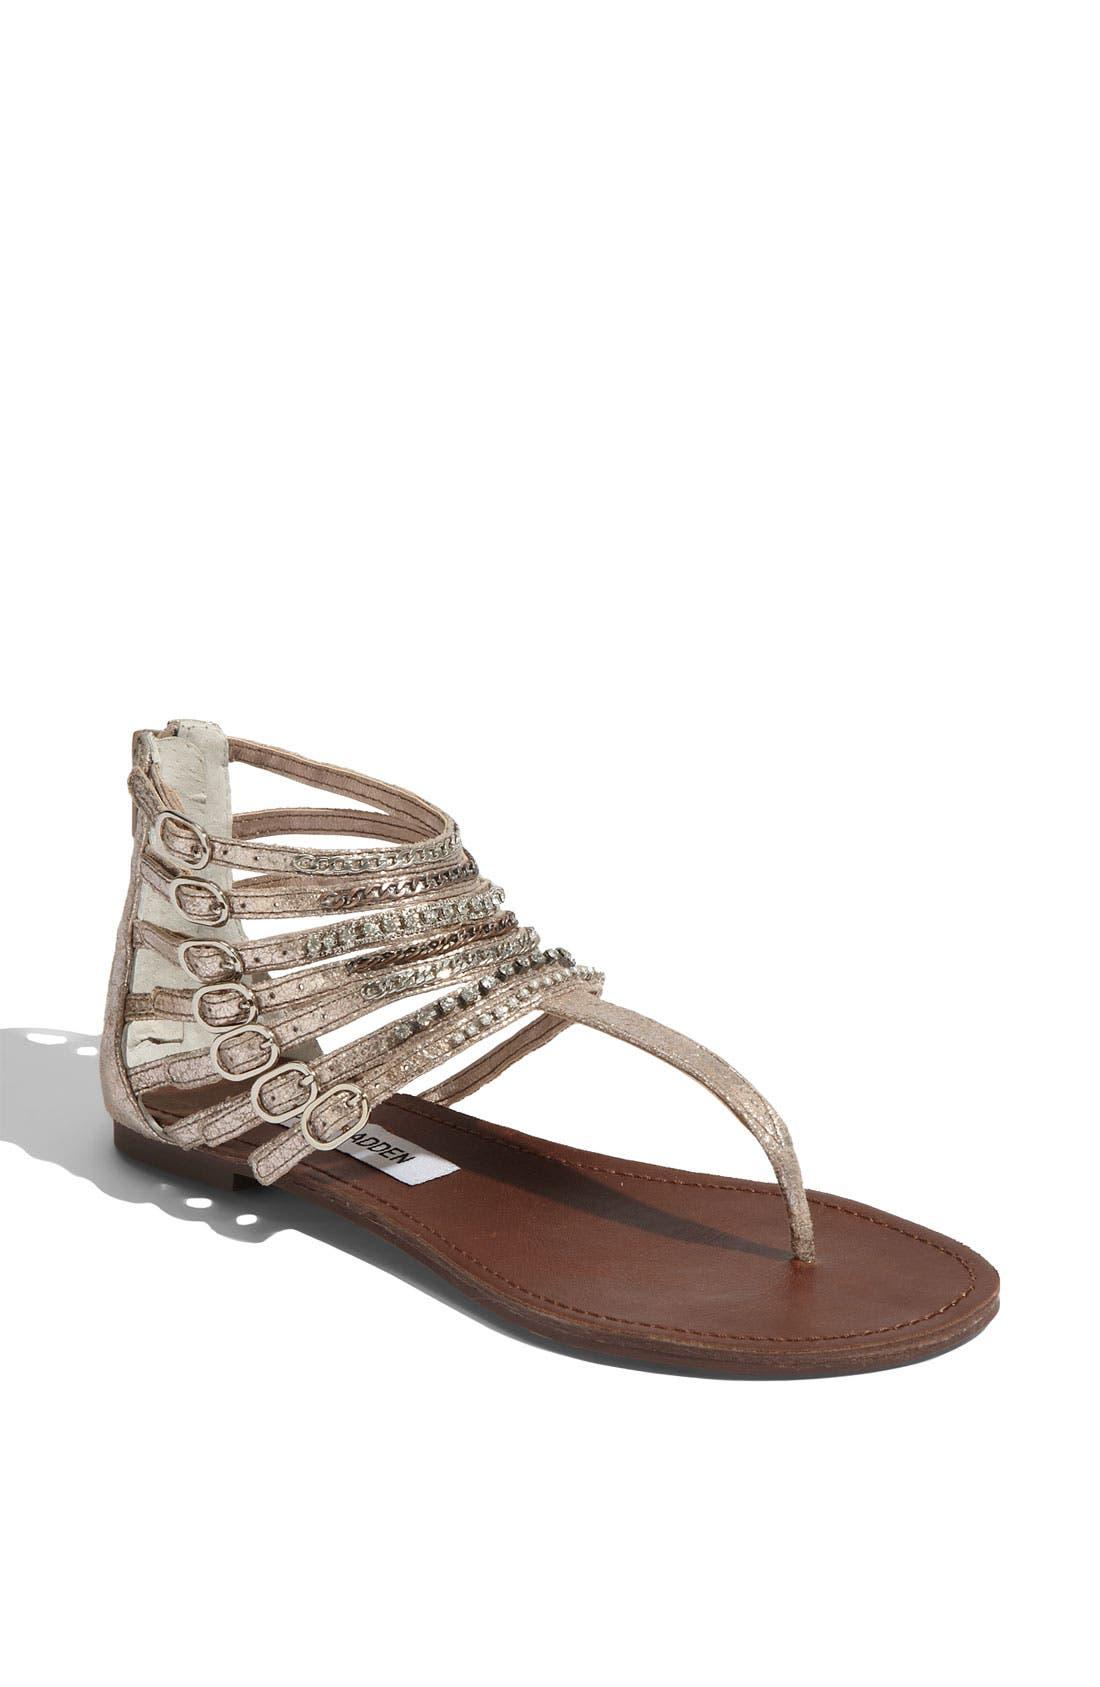 Alternate Image 1 Selected - Steve Madden 'Simple' Leather Sandal